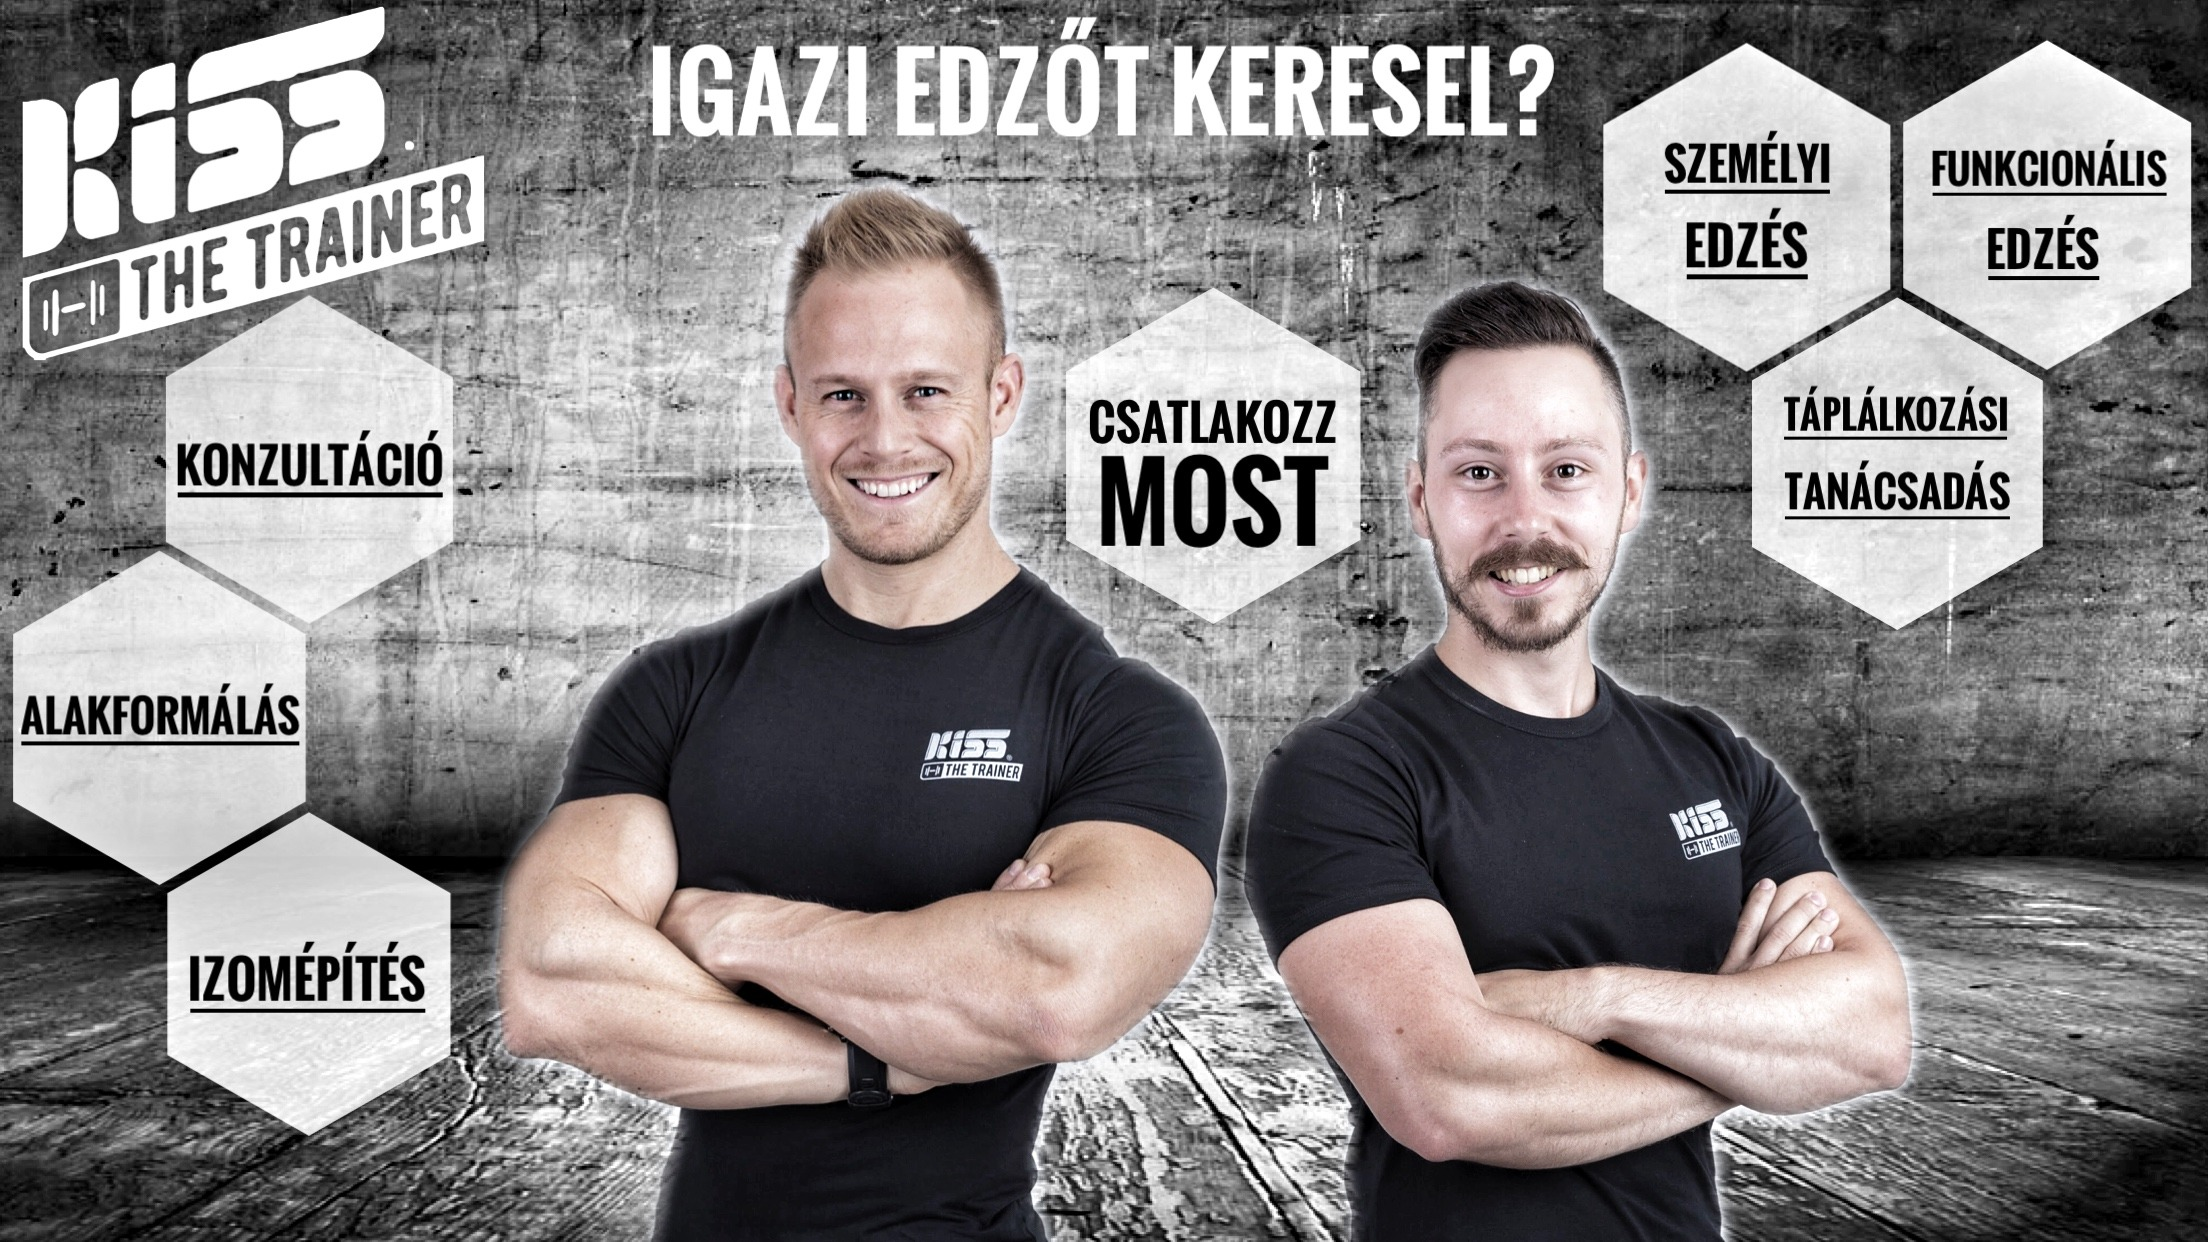 Edzői Csapatom - Kiss The Trainer